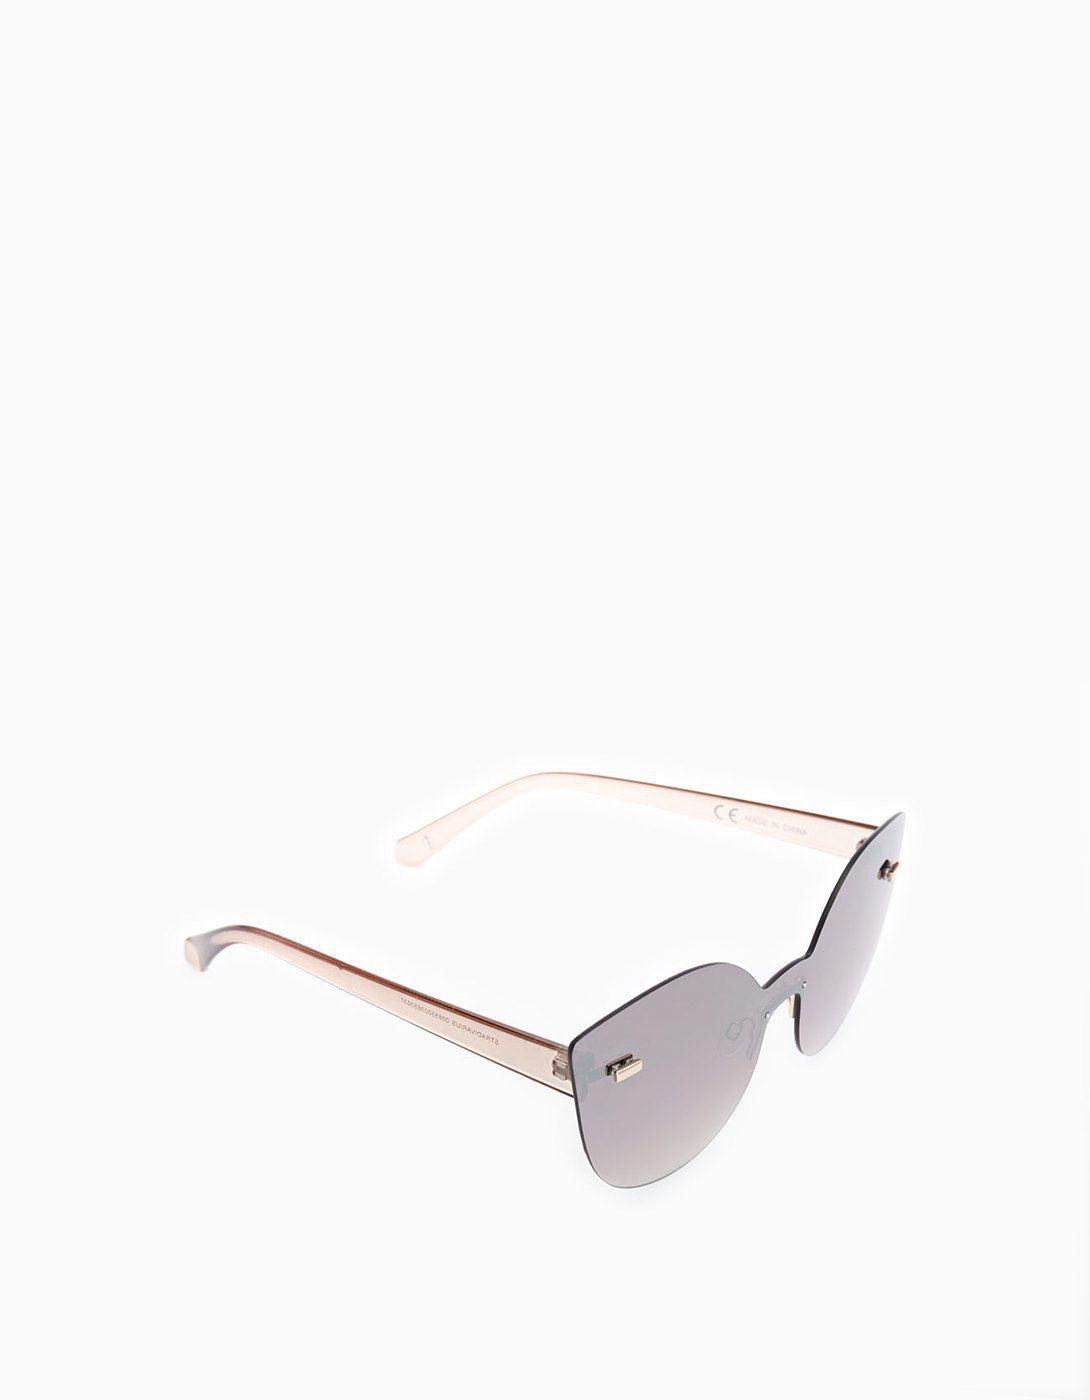 Gafas cateye sin montura - Gafas | Stradivarius España | accesorios ...